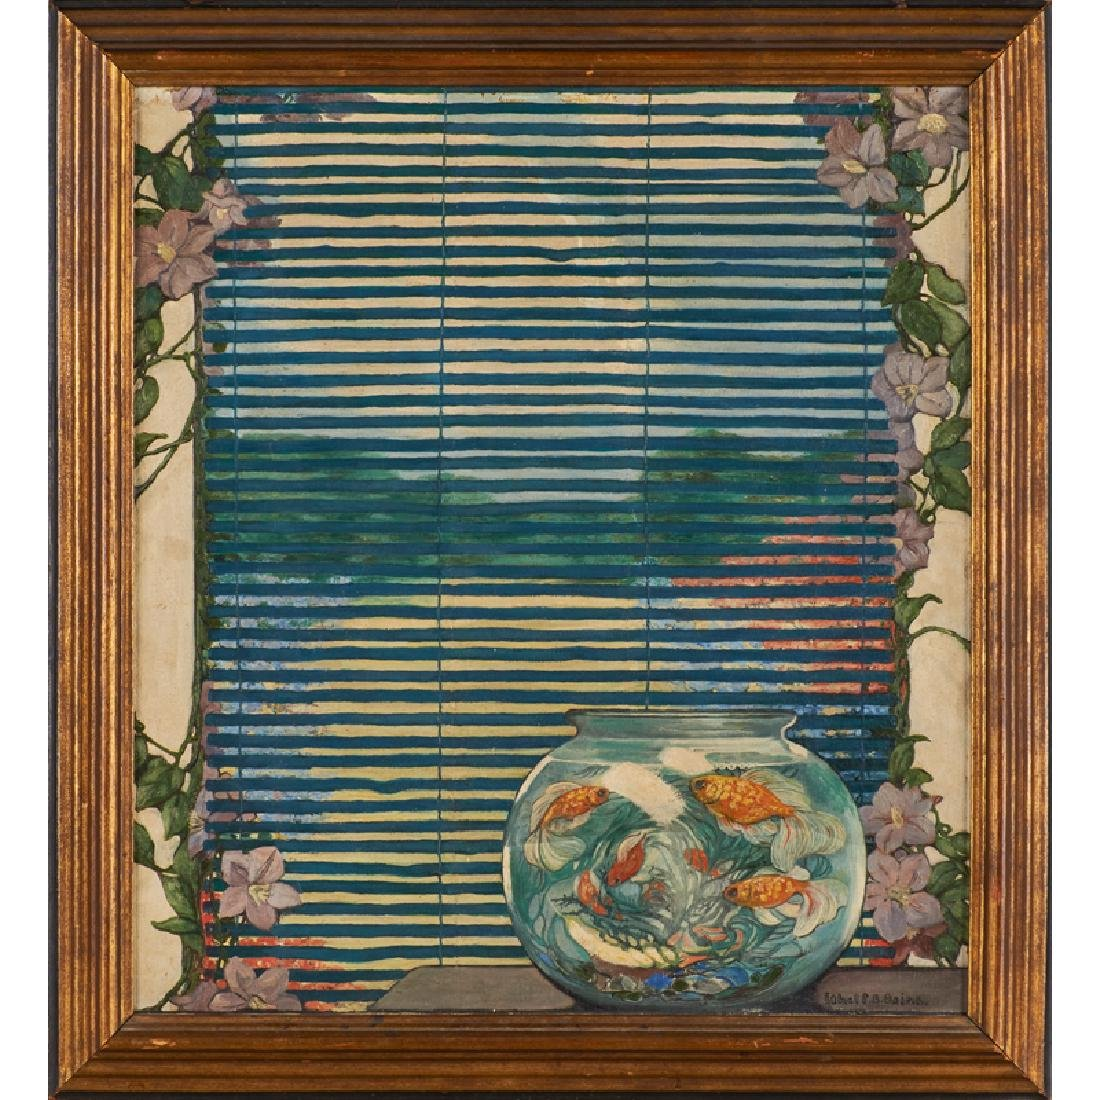 Ethel Franklin (Bains) Betts (American, 1877-1959) - 2